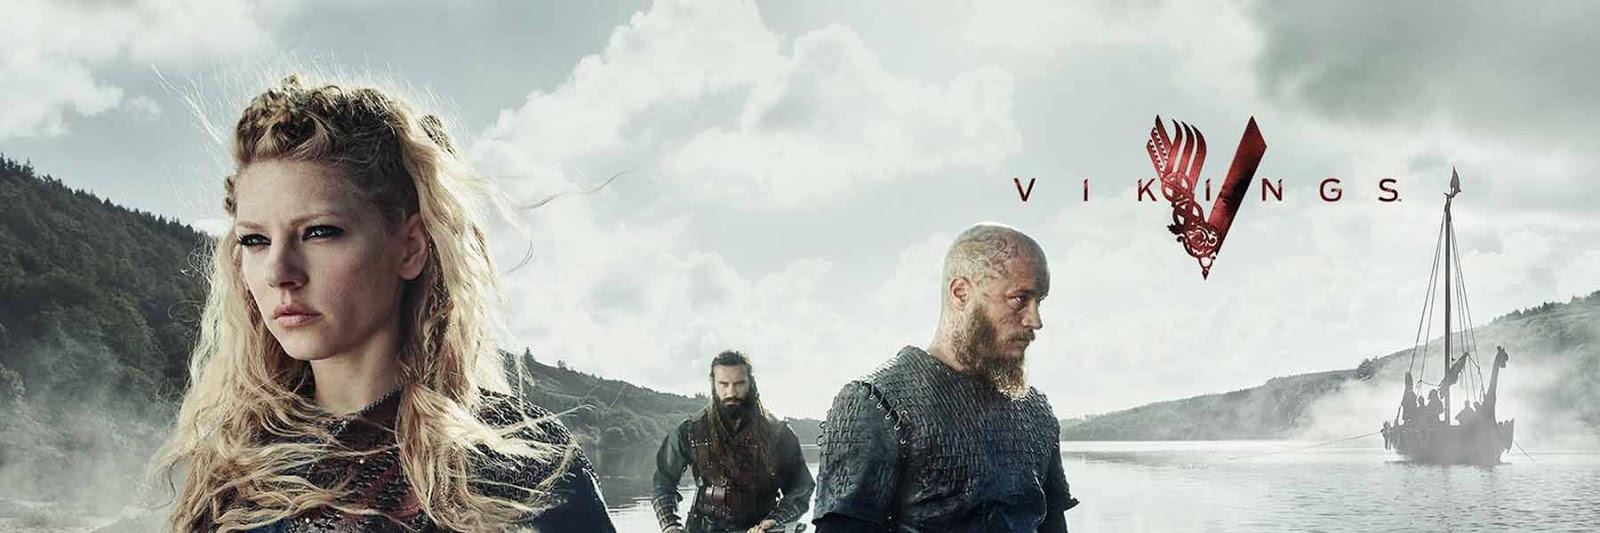 Download Vikings S05E05 (Season 5 Episode 5)